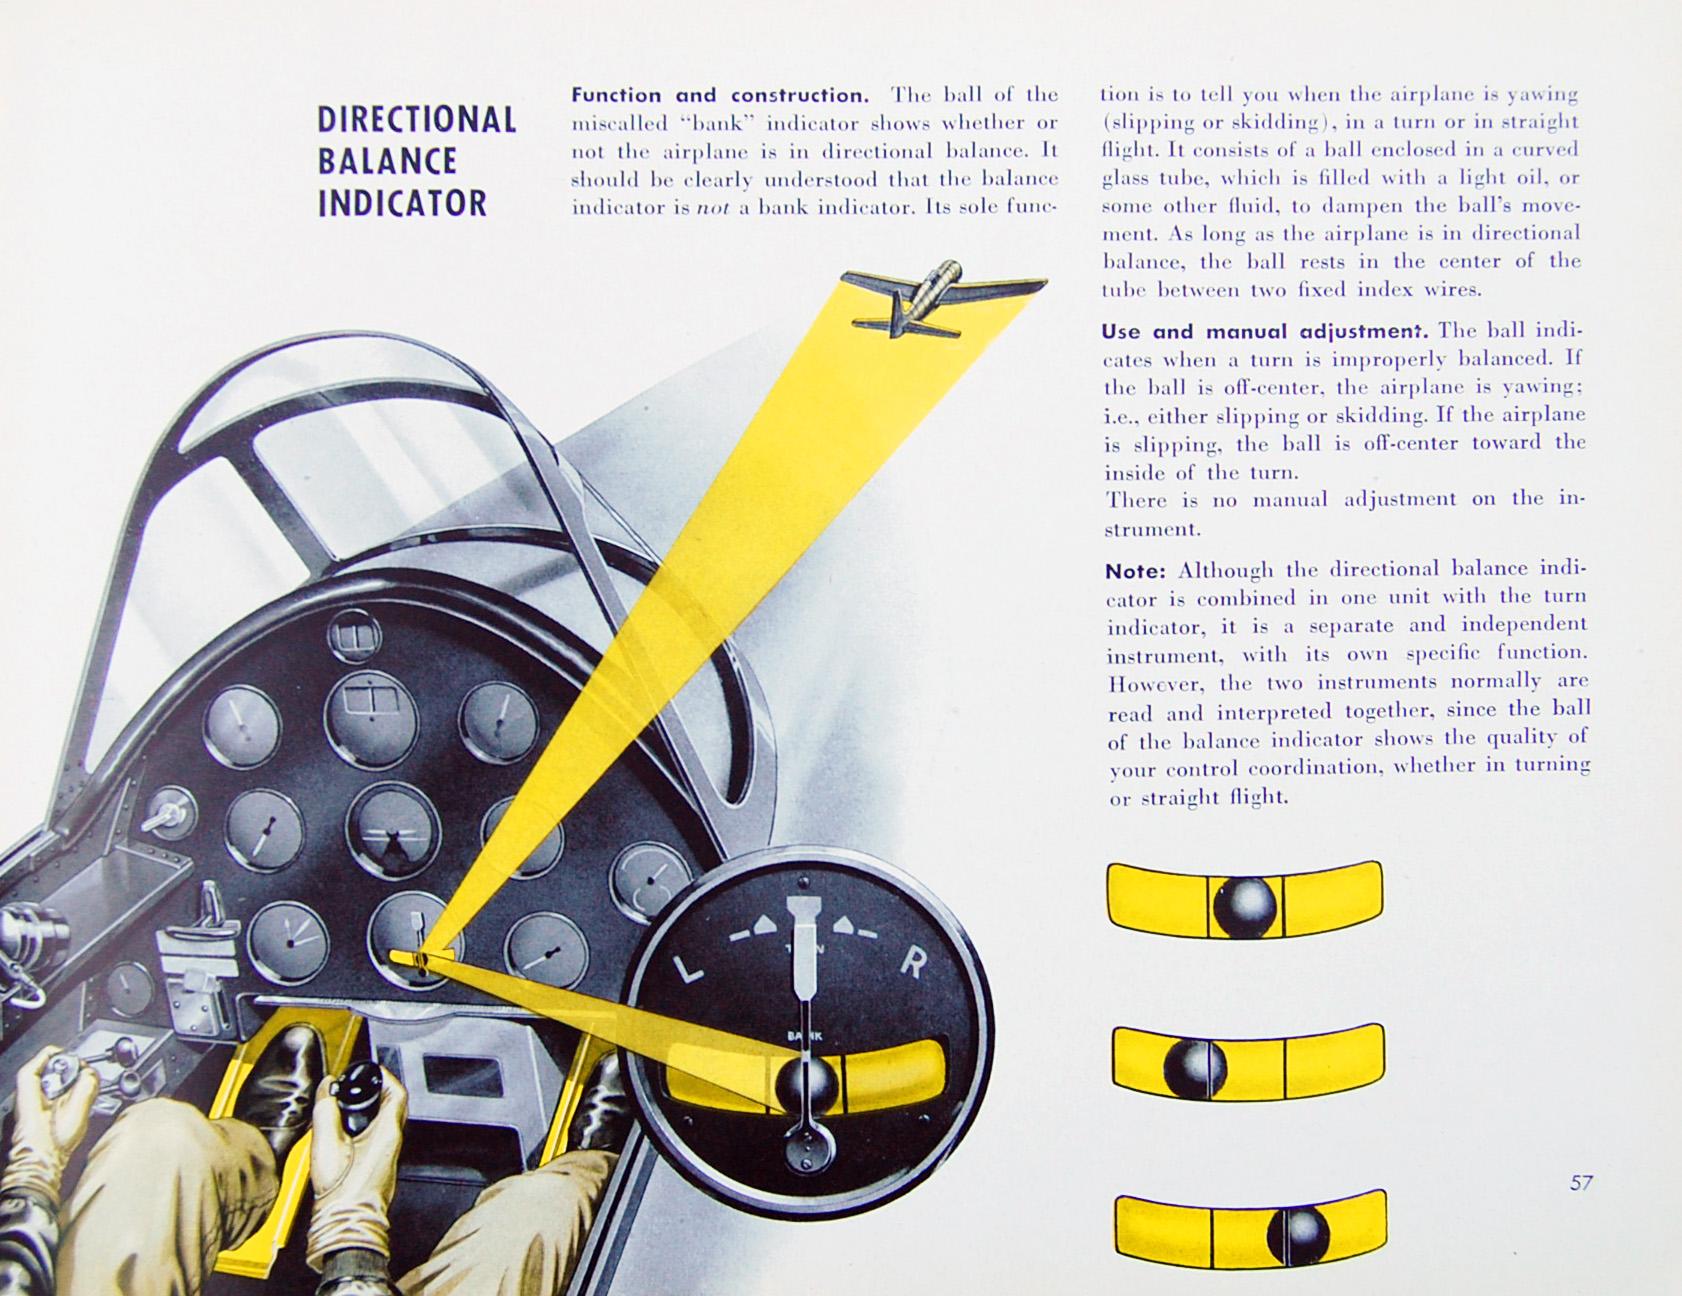 Flight Thru Instruments Manual Balance